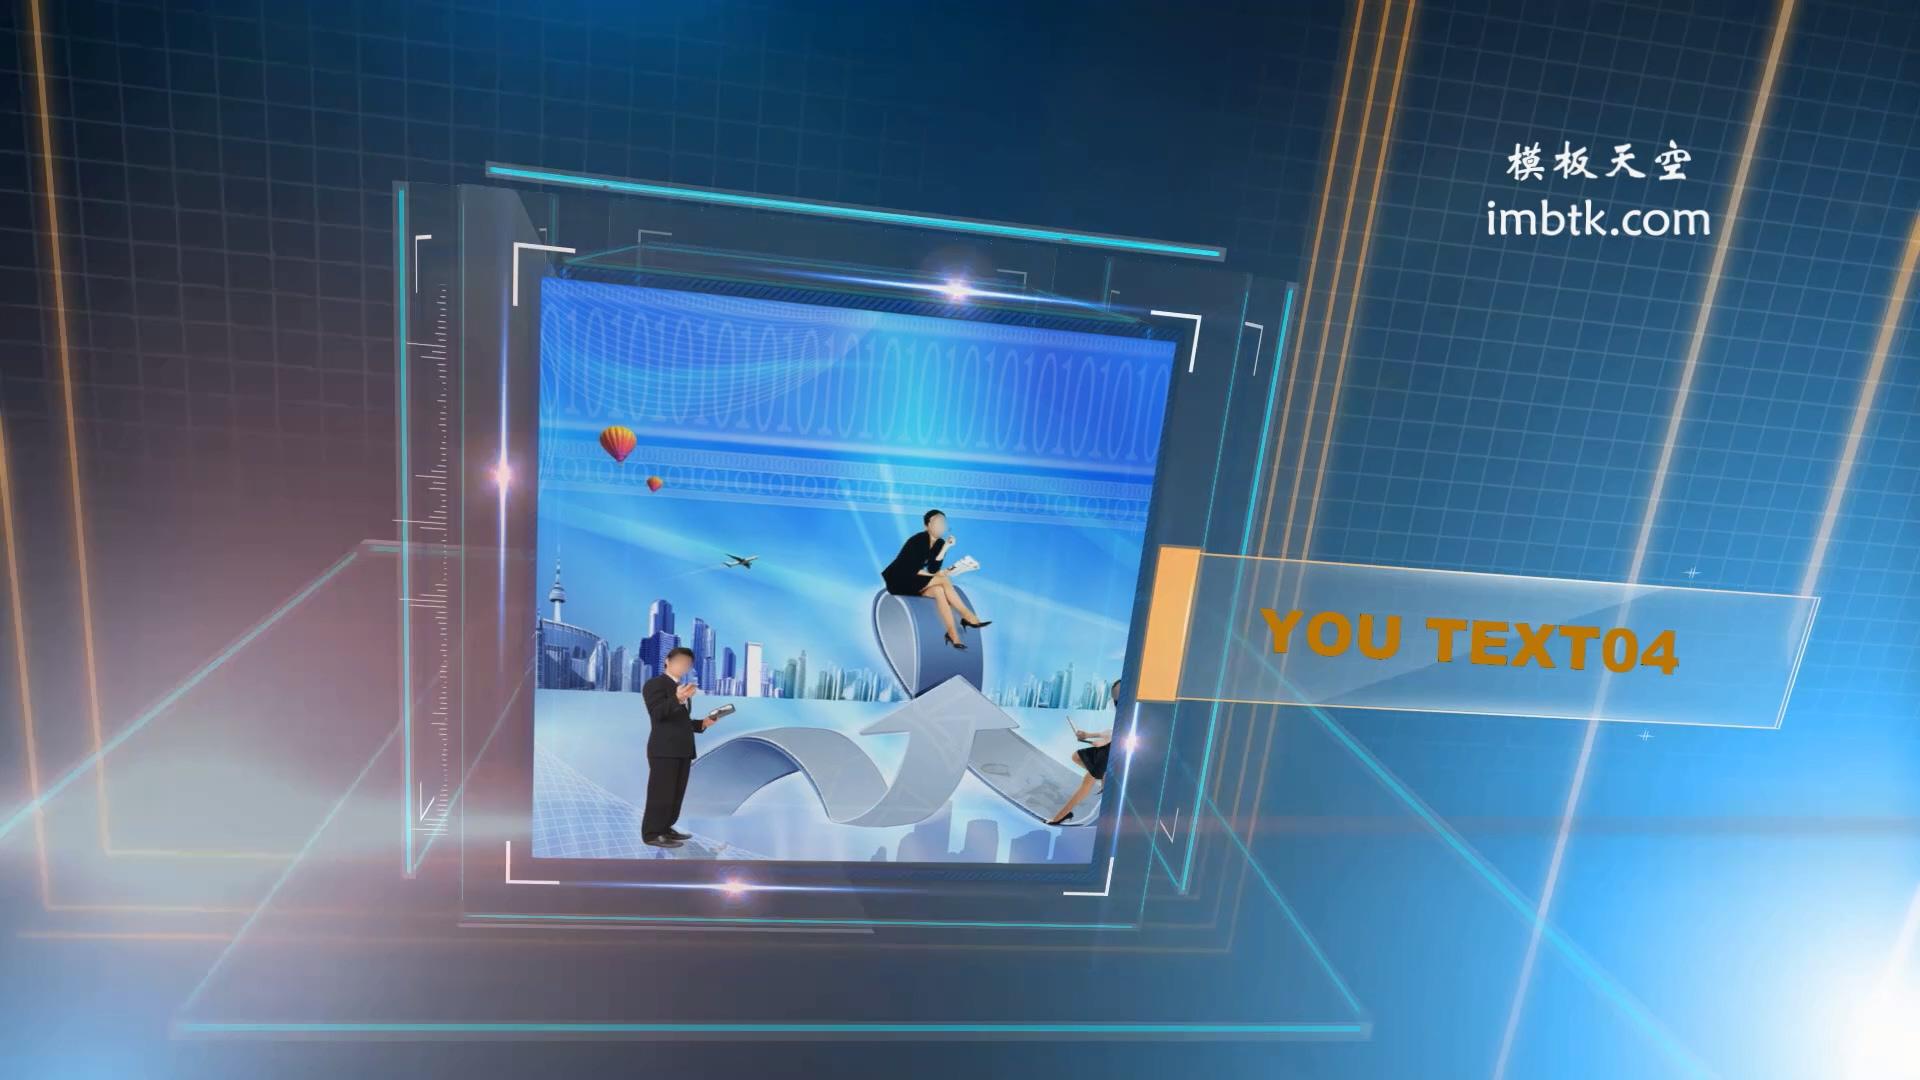 3D现代科技信息互联网企业宣传介绍会声会影X6模板